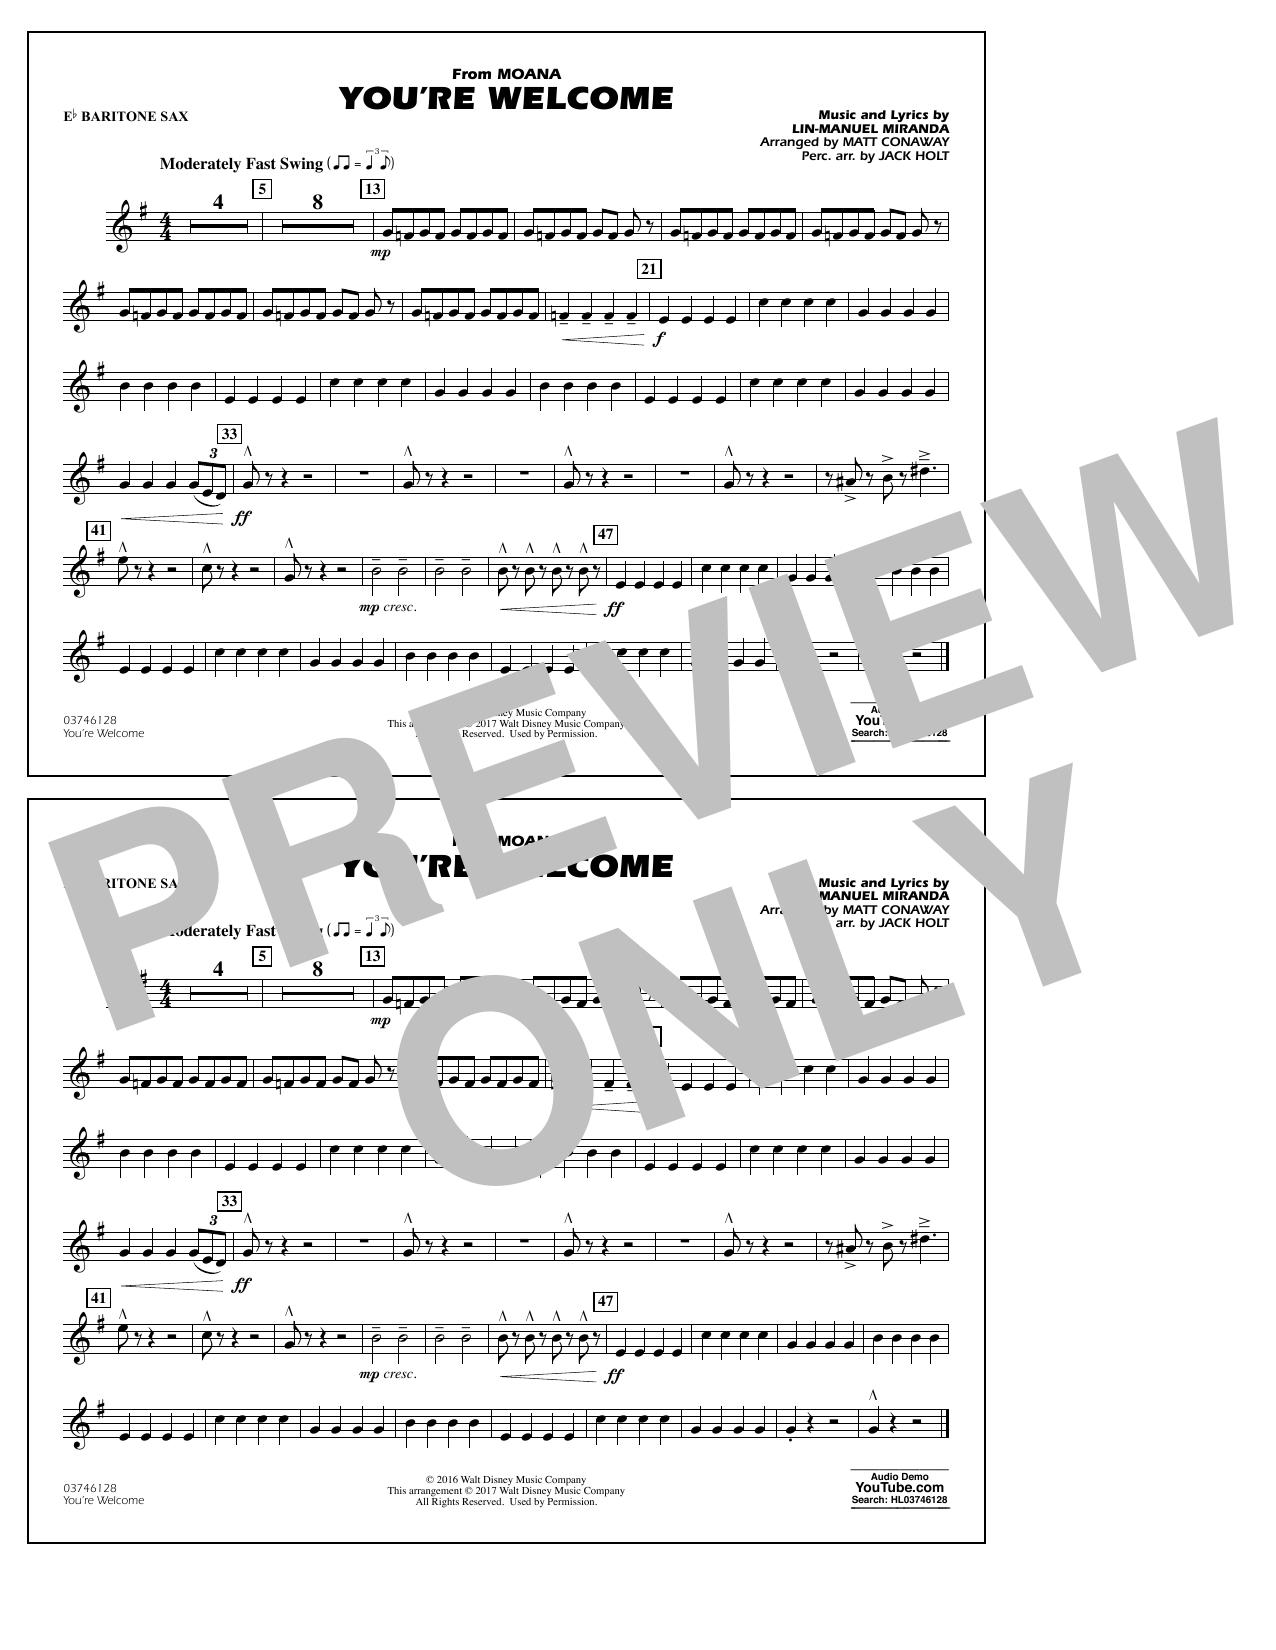 You're Welcome (from Moana) - Eb Baritone Sax Sheet Music